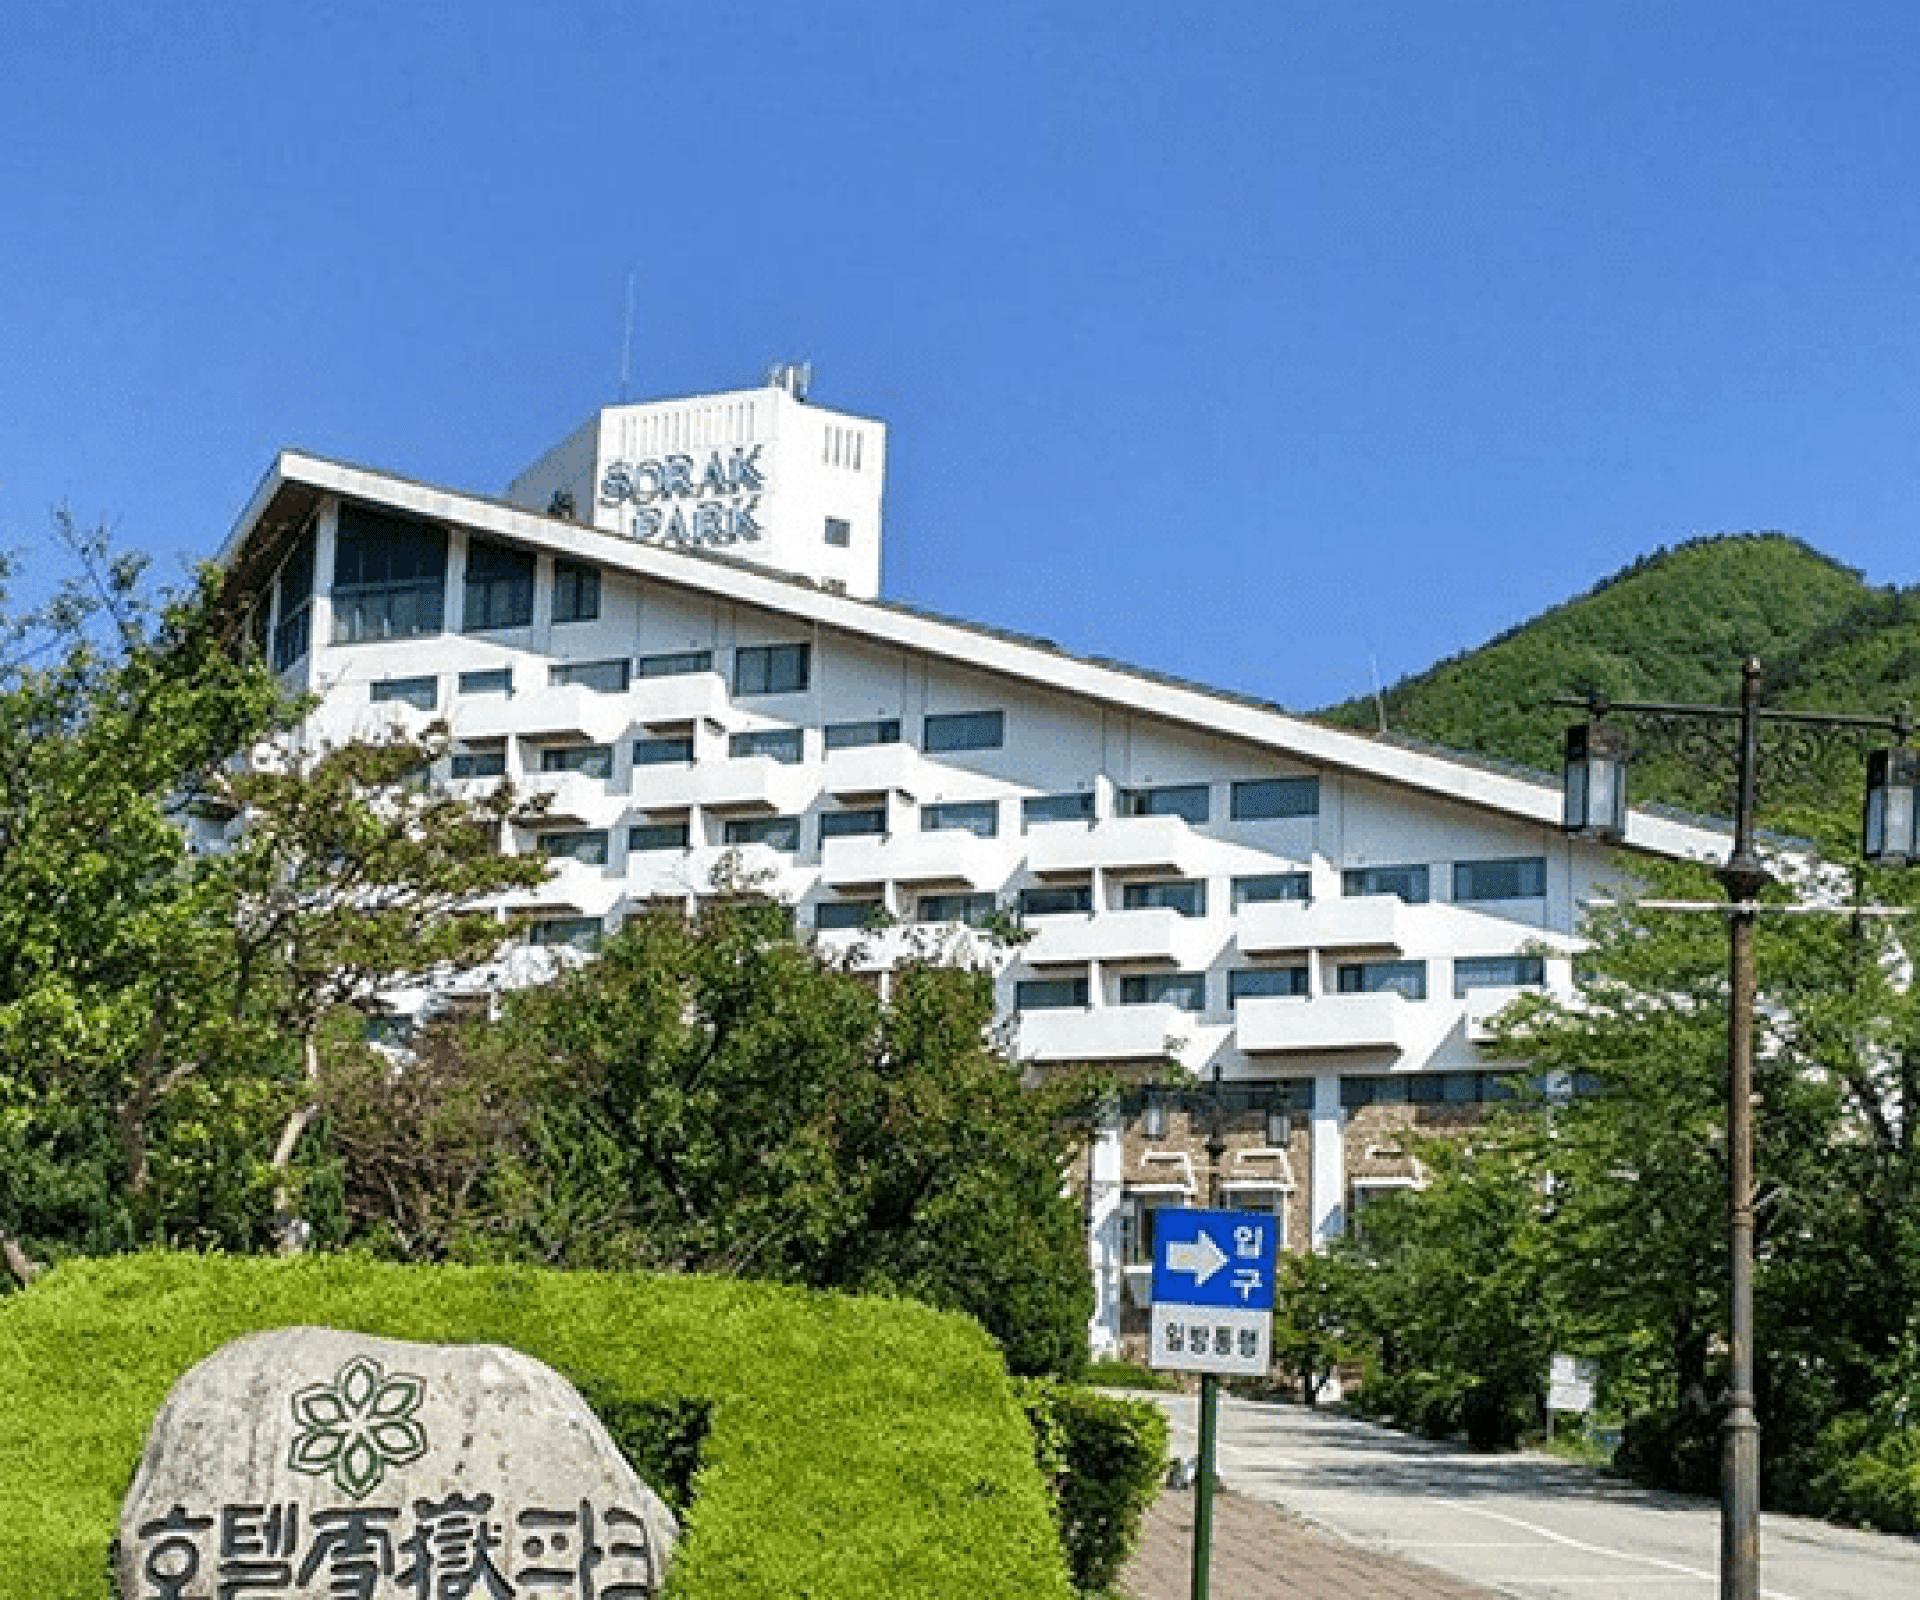 Sorak Park Hotel & Casino | Seorak-dong, Gangwon-do